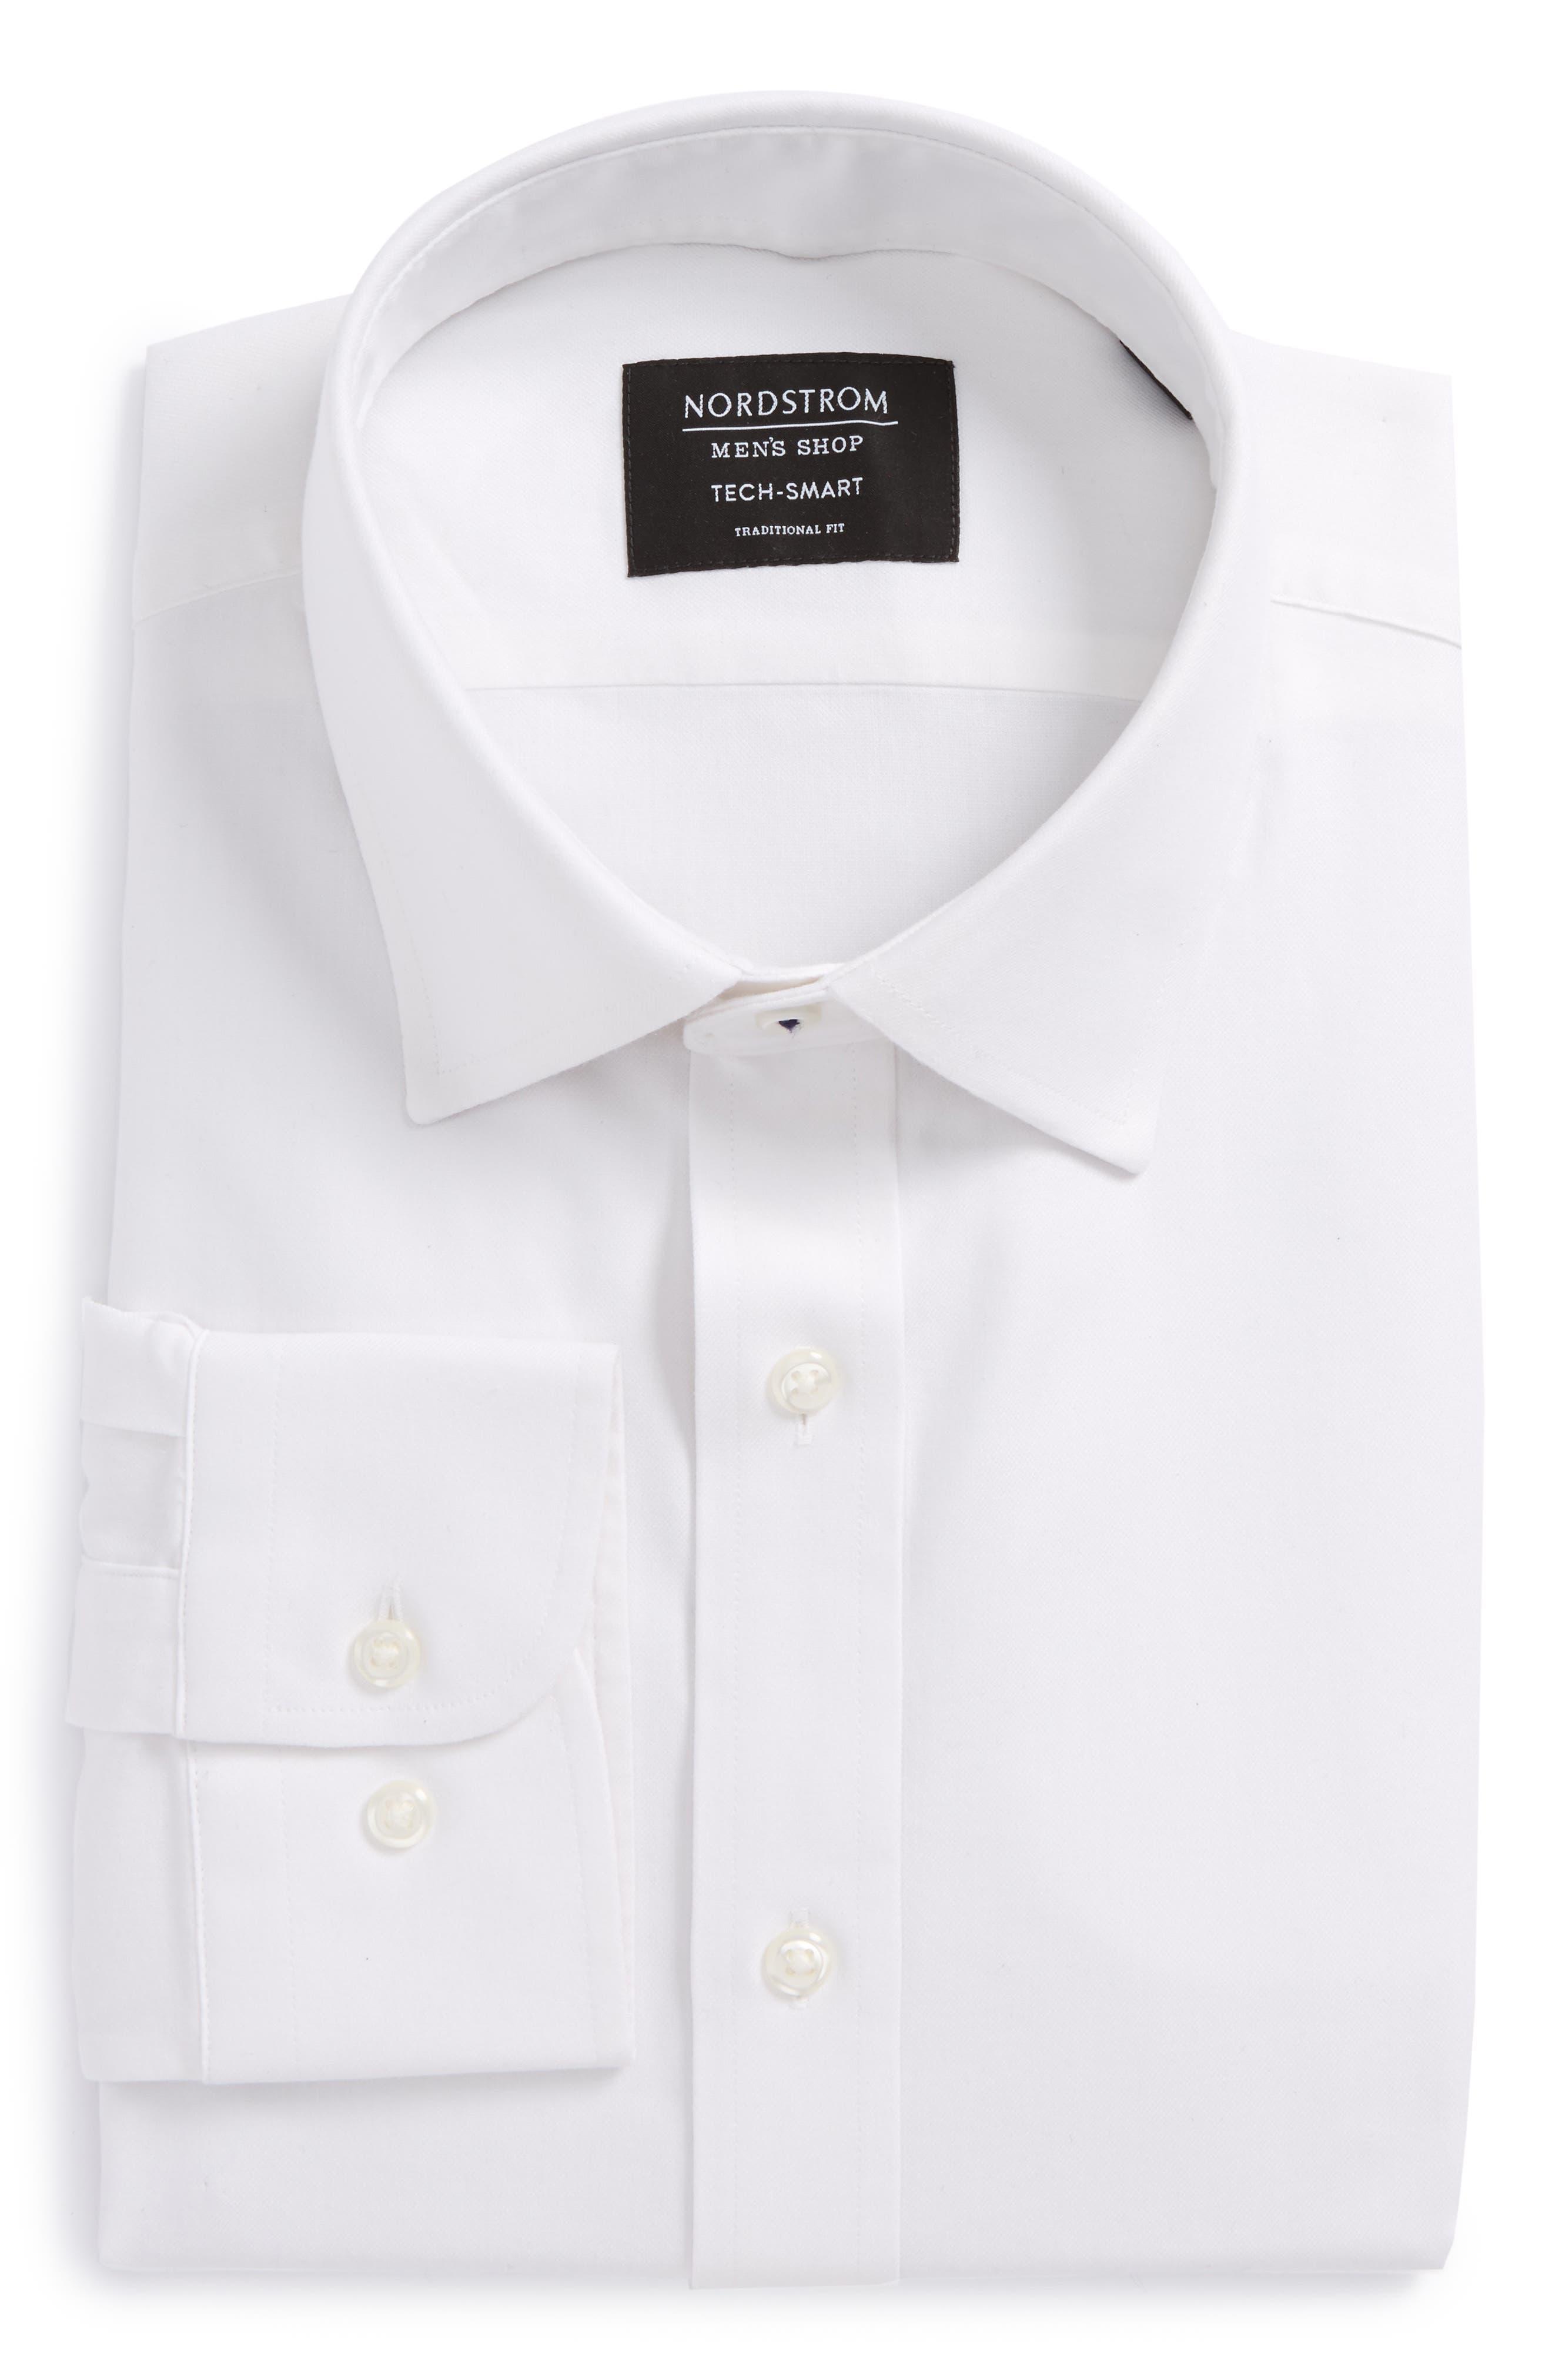 Main Image - Nordstrom Men's Shop Tech-Smart Traditional Fit Solid Dress Shirt